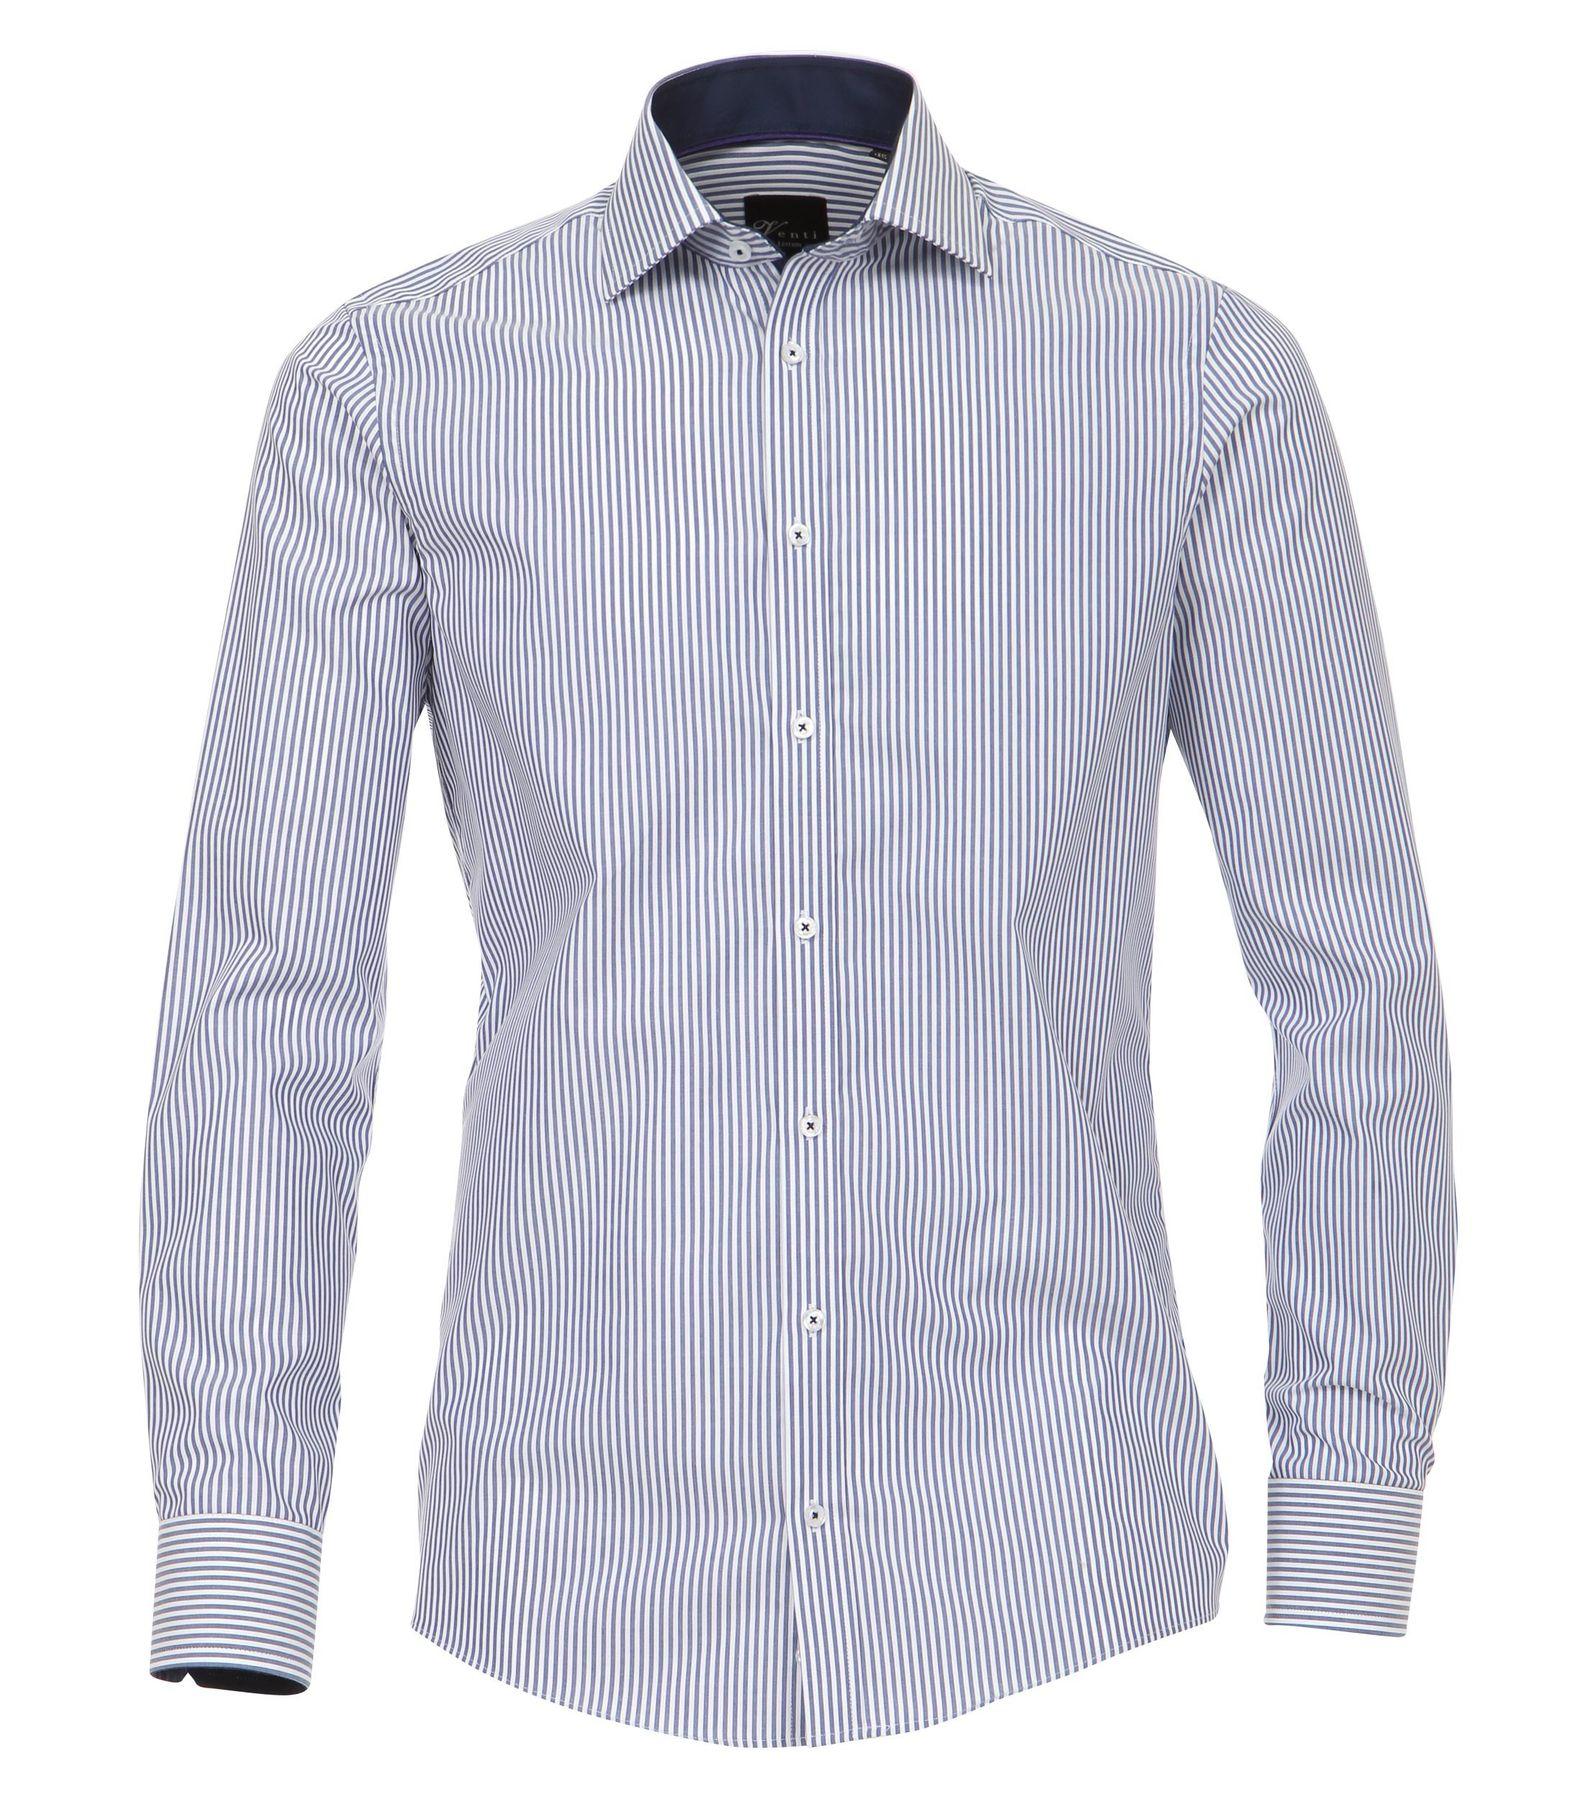 Venti - Slim Fit - Herren Popeline Hemd gestreift mit Kent Kragen (172726700) – Bild 6